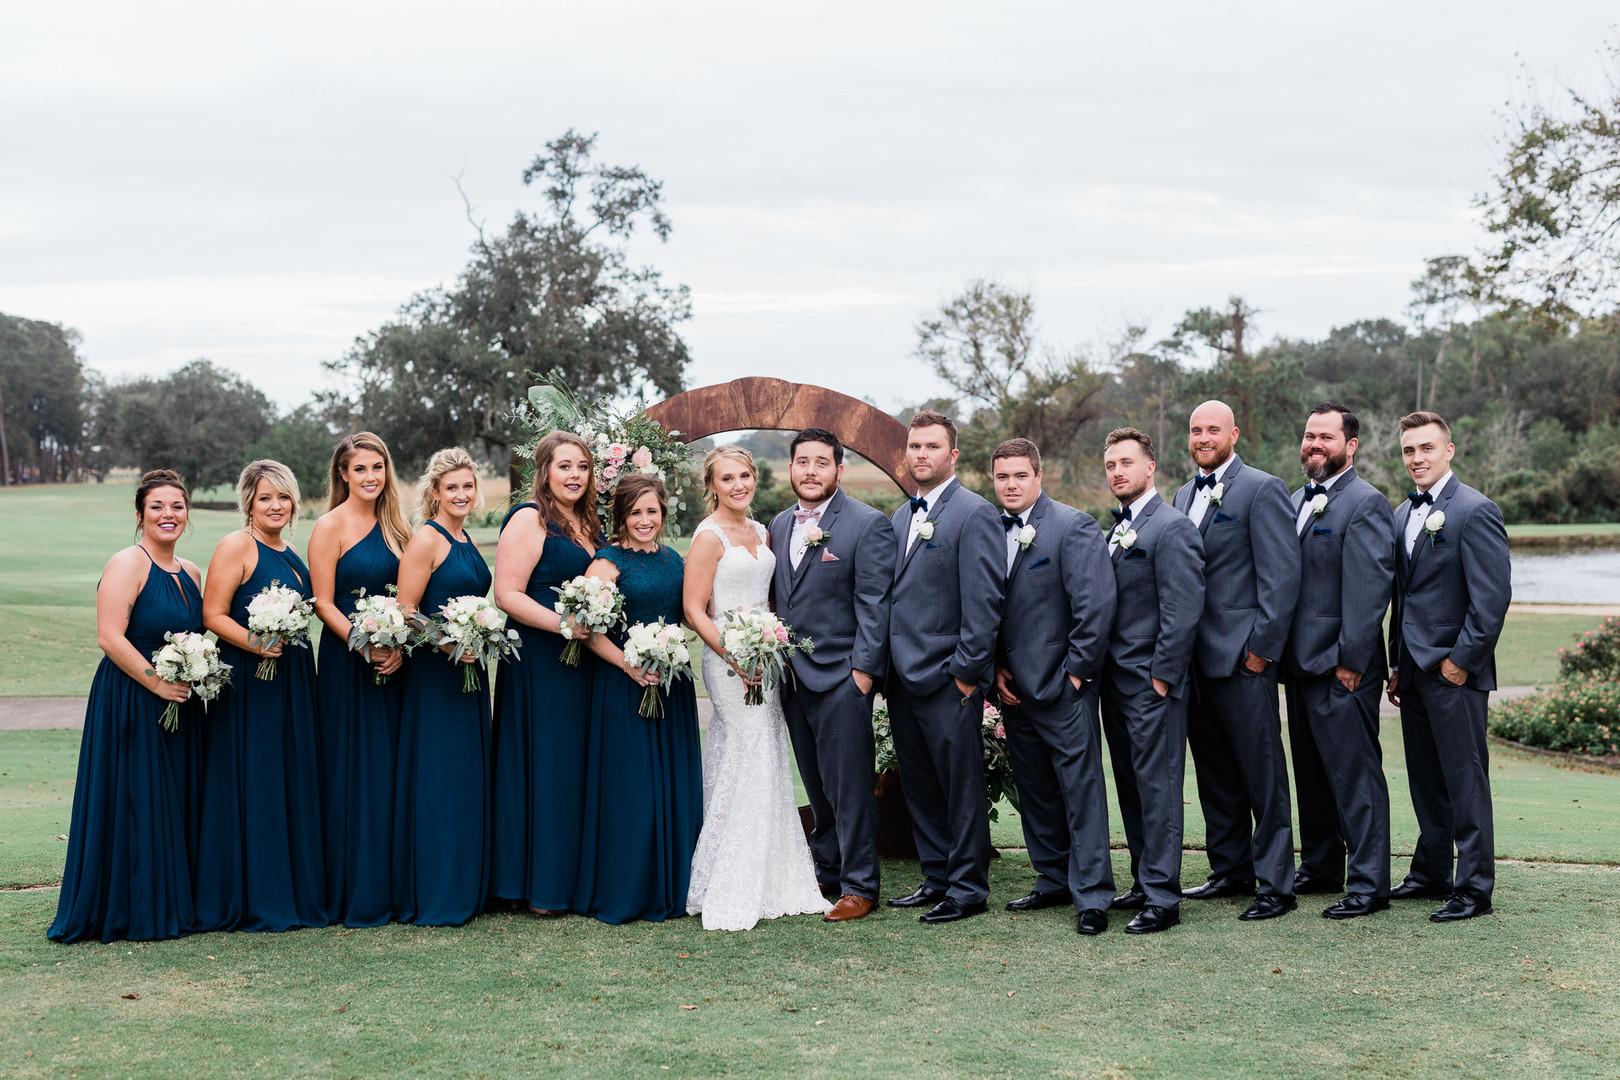 pawleys-plantation-wedding-31.jpg